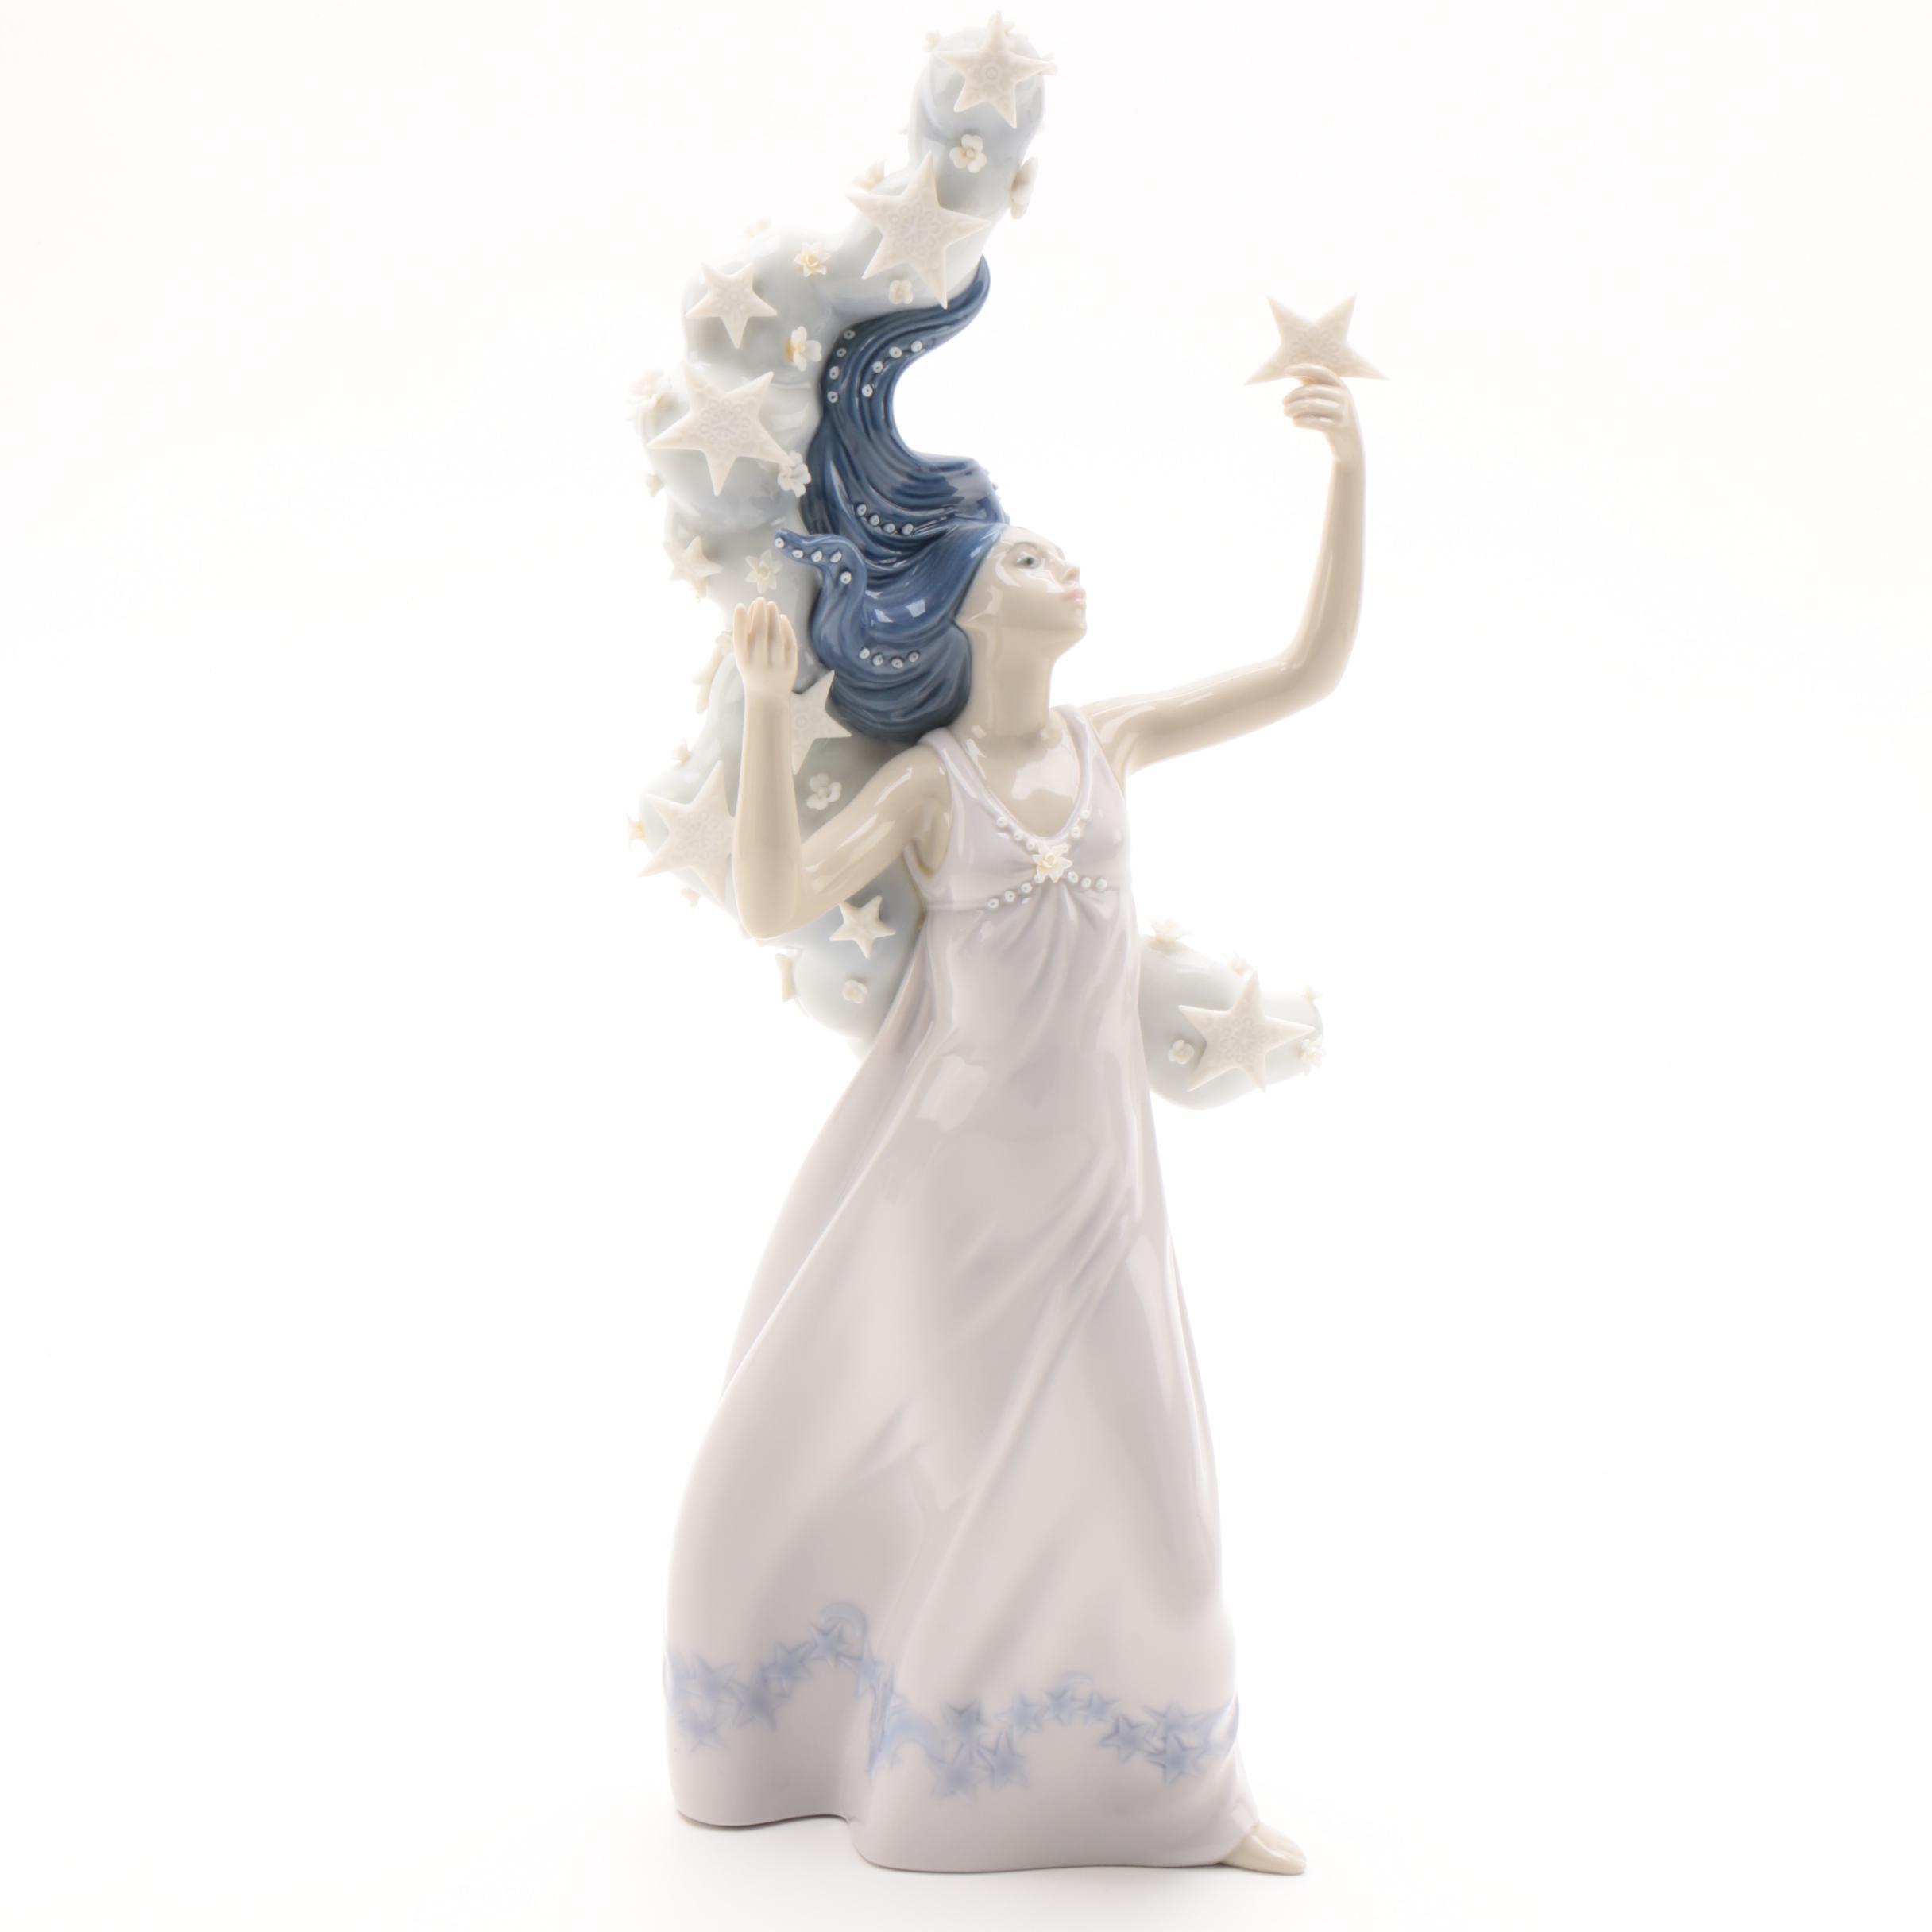 "Lladró Inspiration Millennium Collection ""Milky Way"" Porcelain Figurine, 1998"